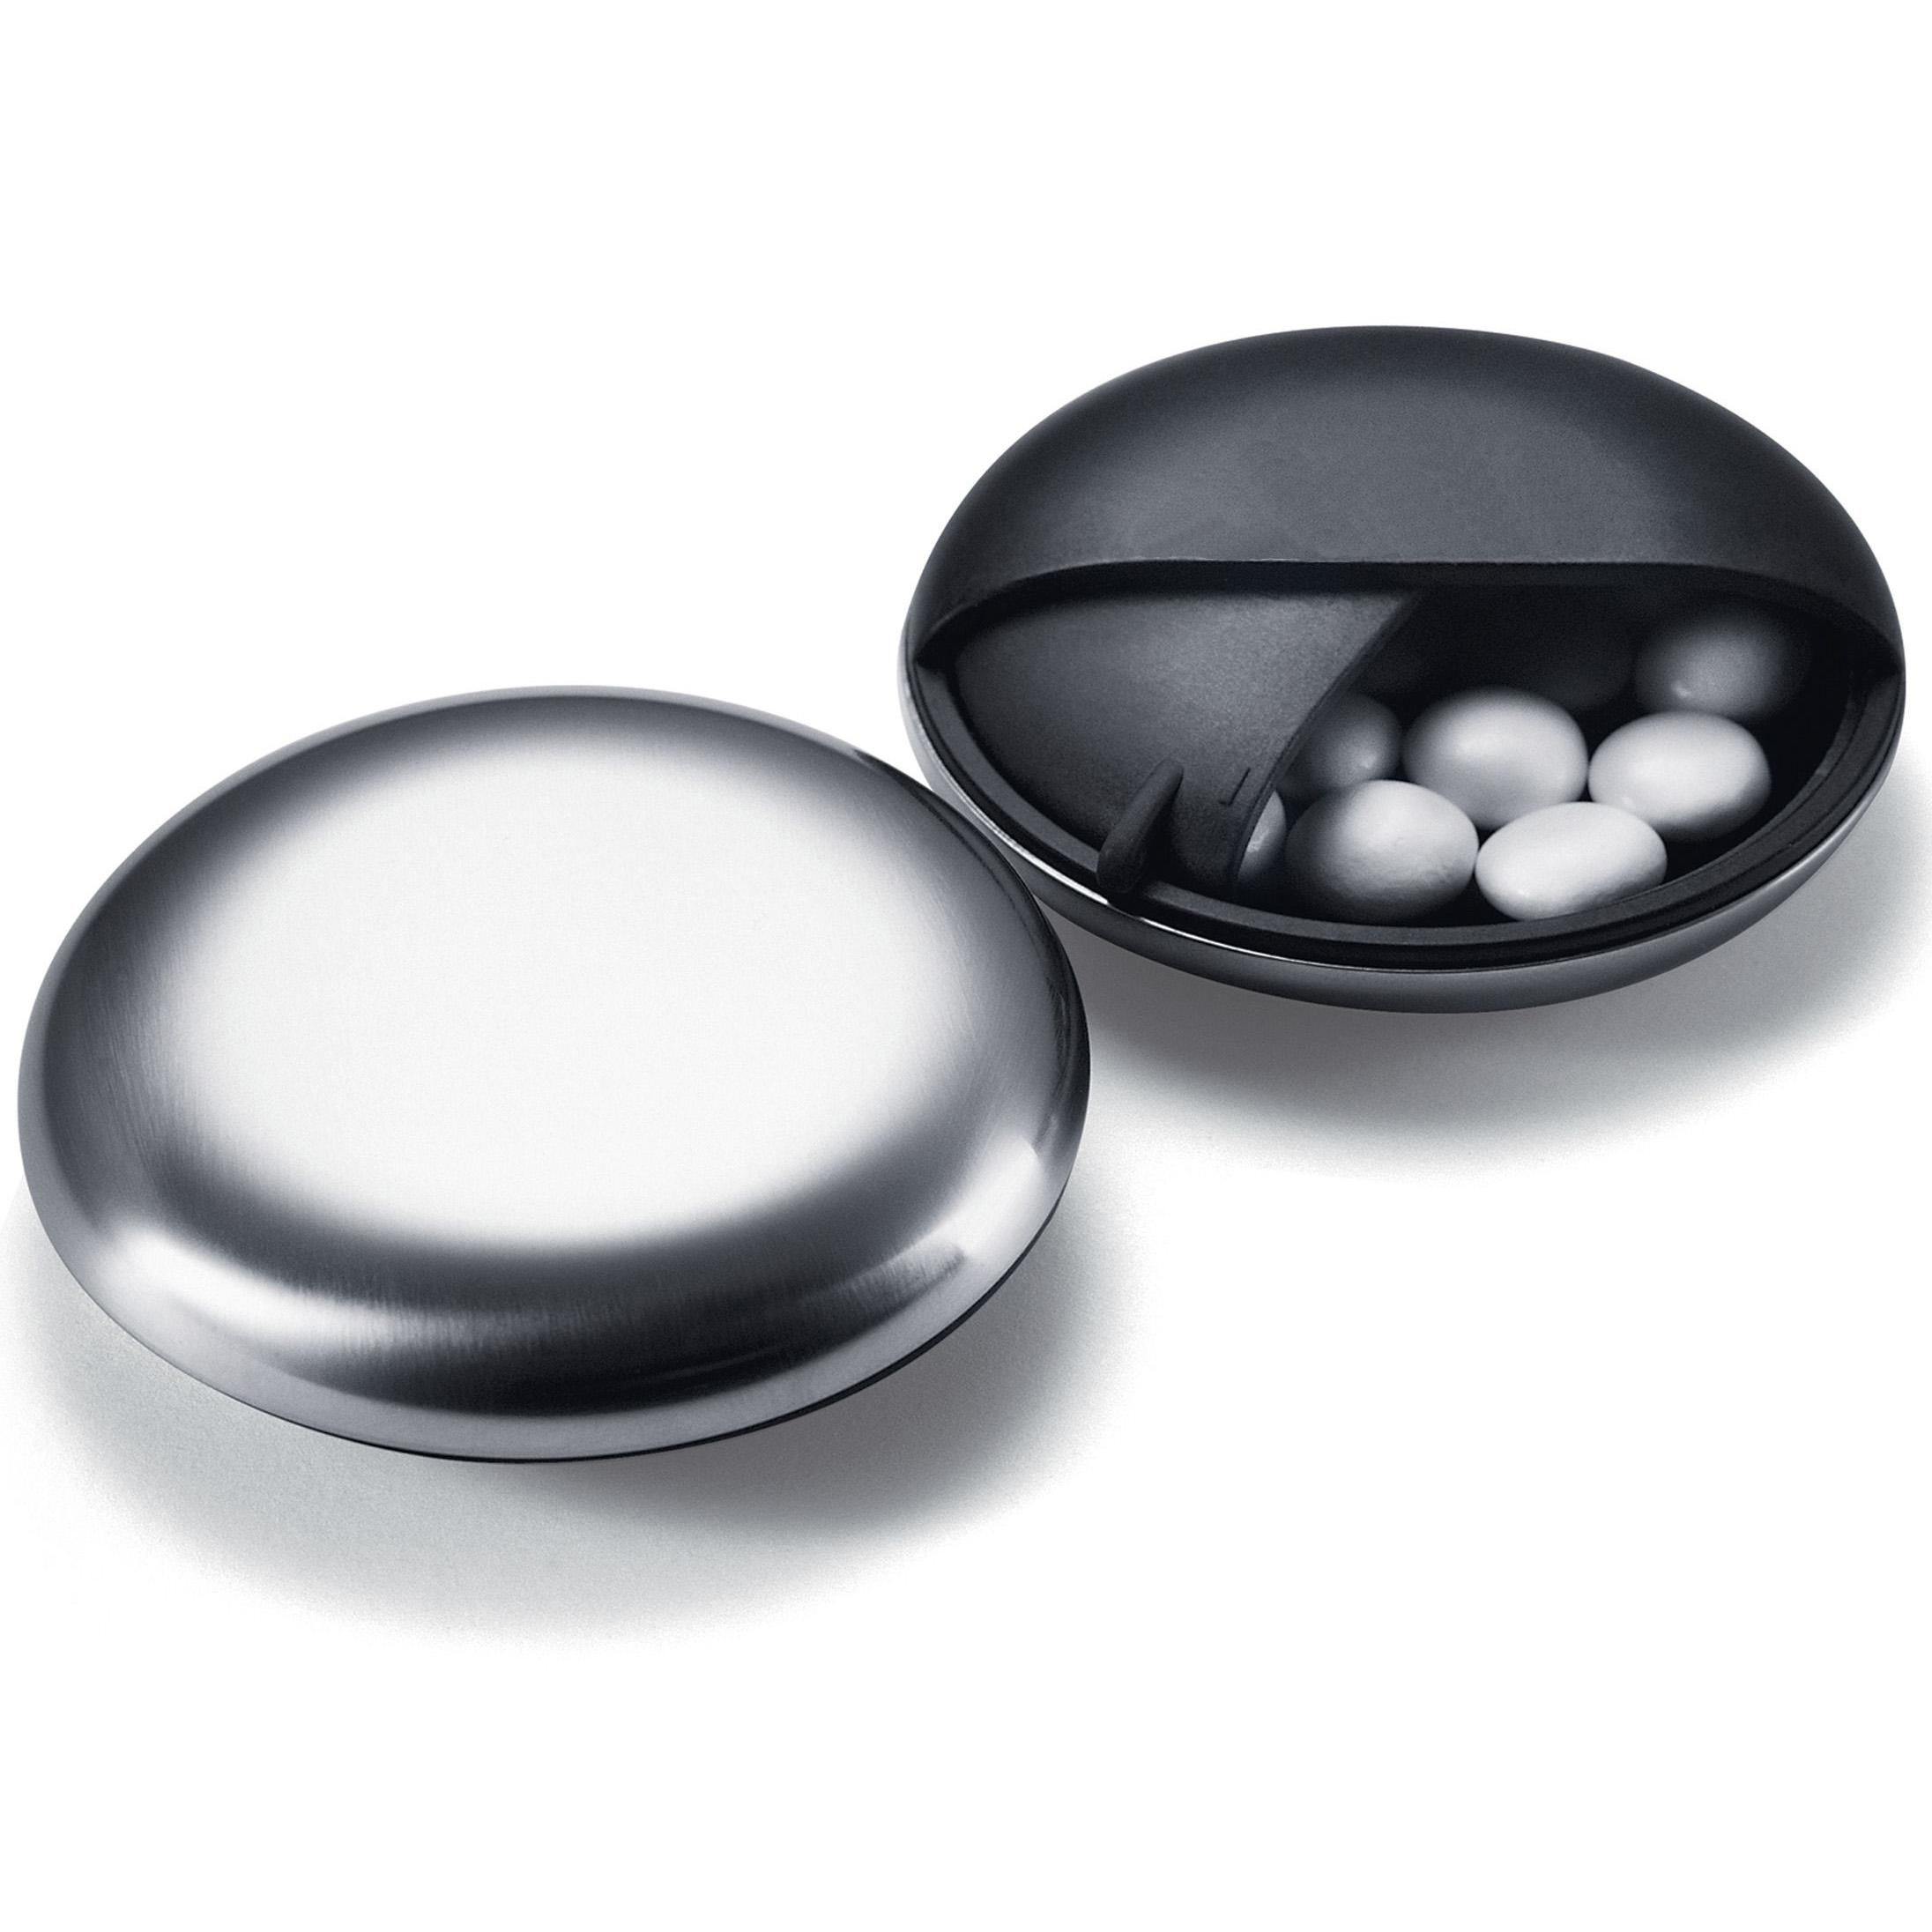 mopa药盒 随身小药盒 创意药盒口香糖盒时尚小收纳盒礼品定制19.00元包邮